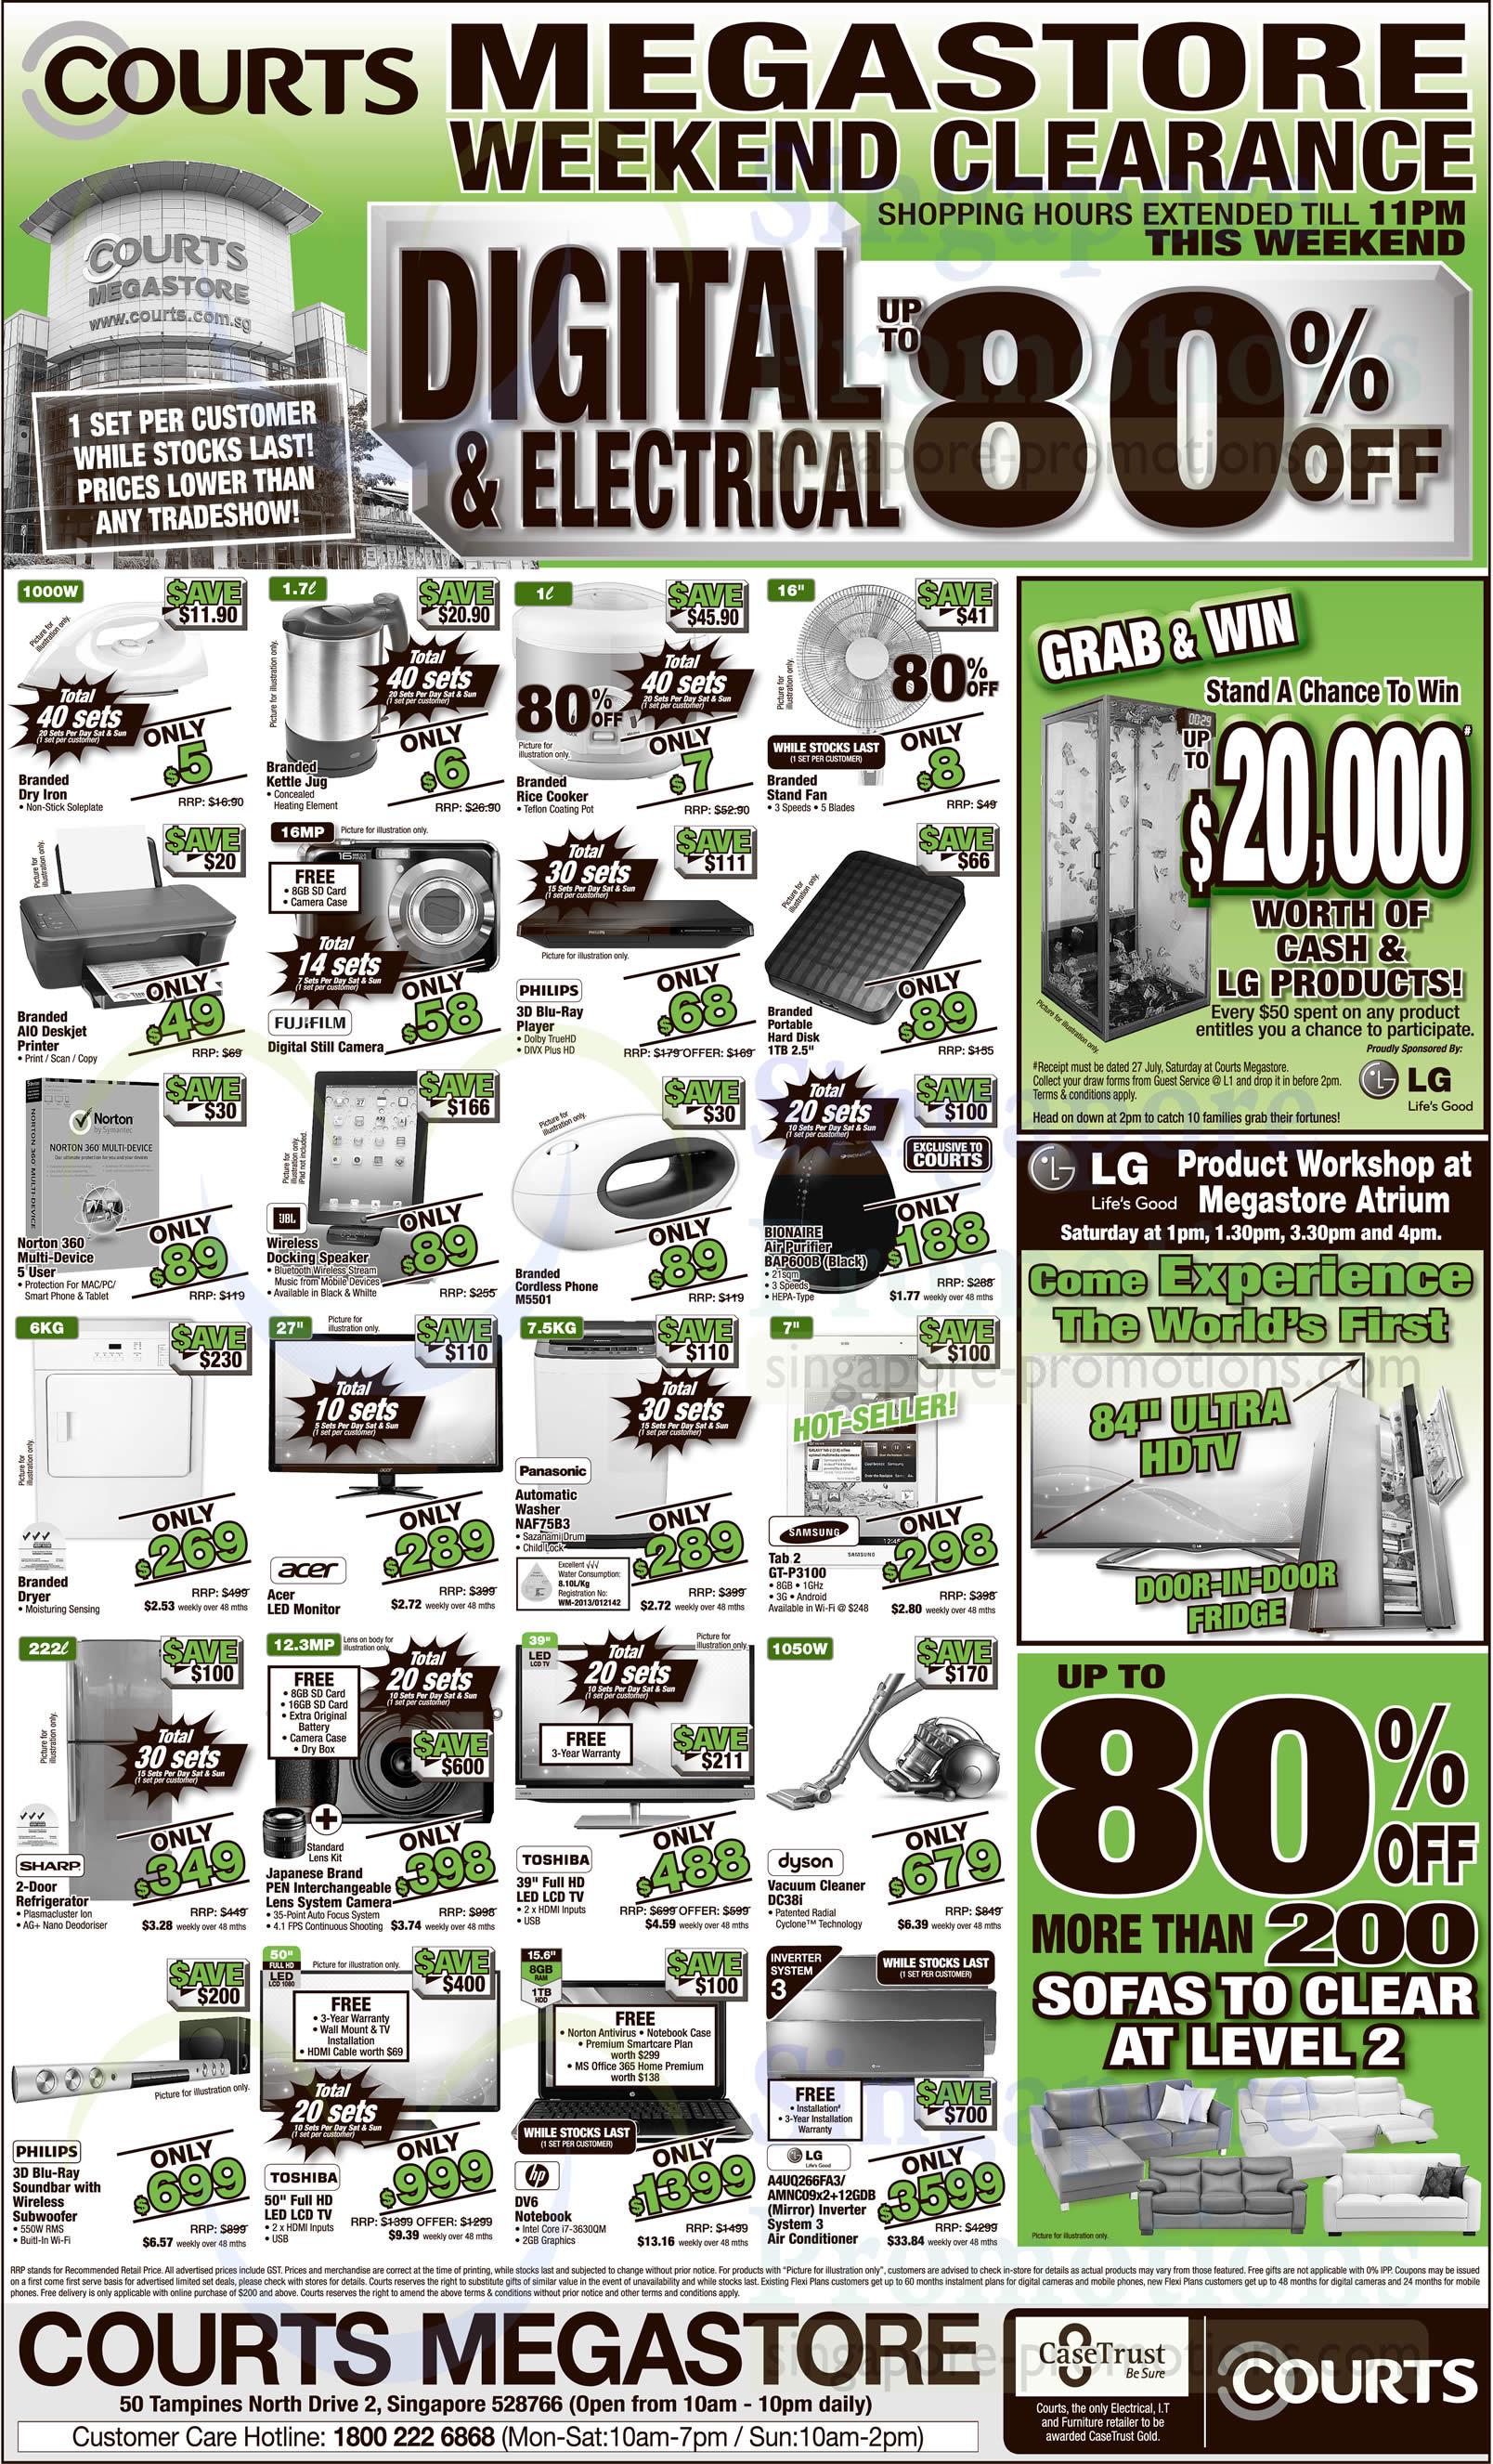 Bionaire BAP600B Air Purifier, Panasonic NAF75B3 Washer and Dyson DC38i Vacuum Cleaner